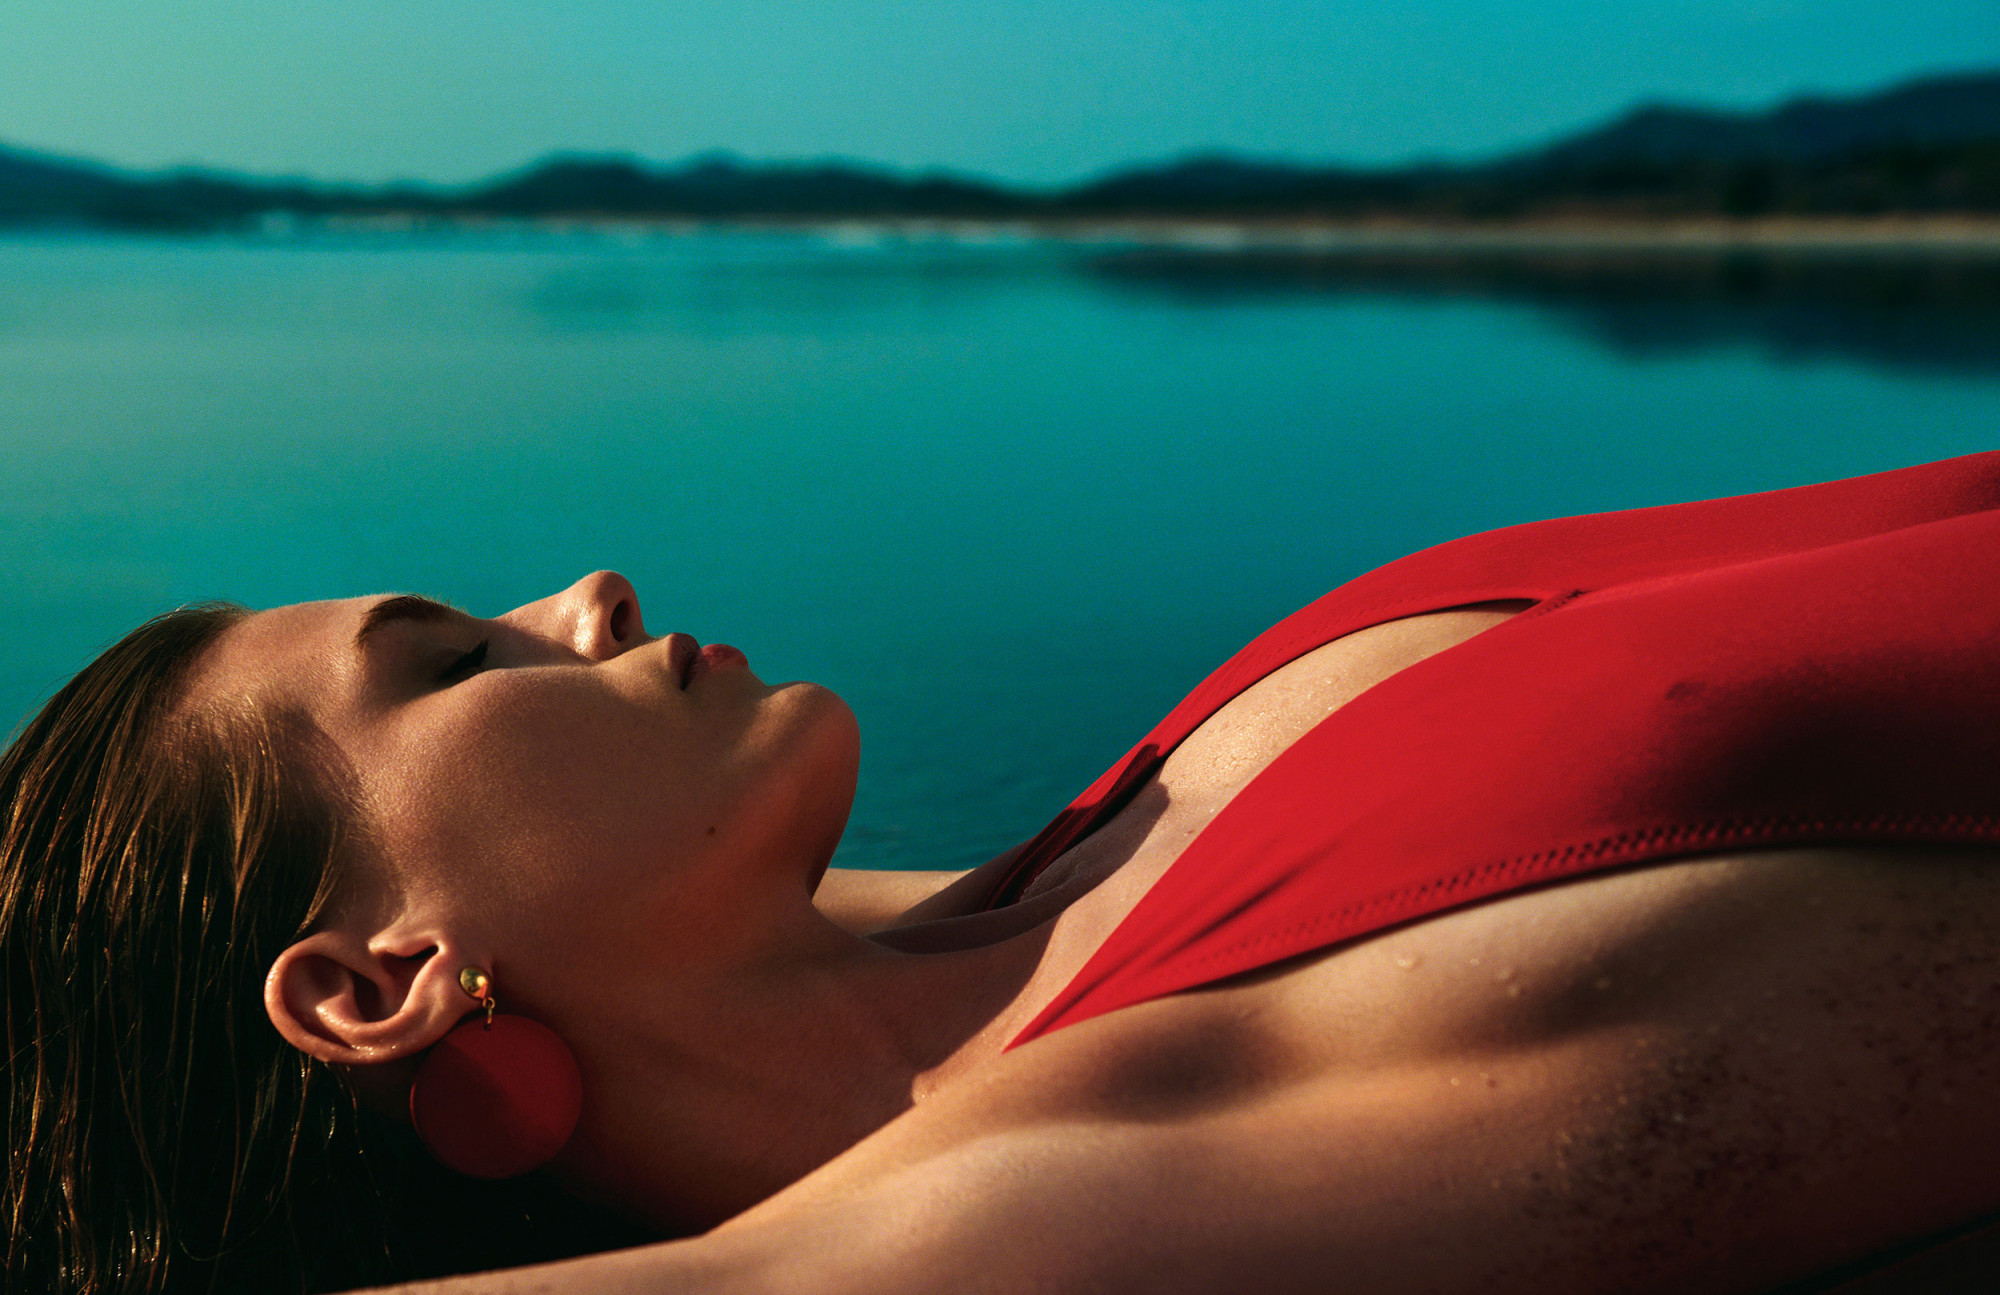 Bjorn Iooss Vogue Spain - Madison Headrick